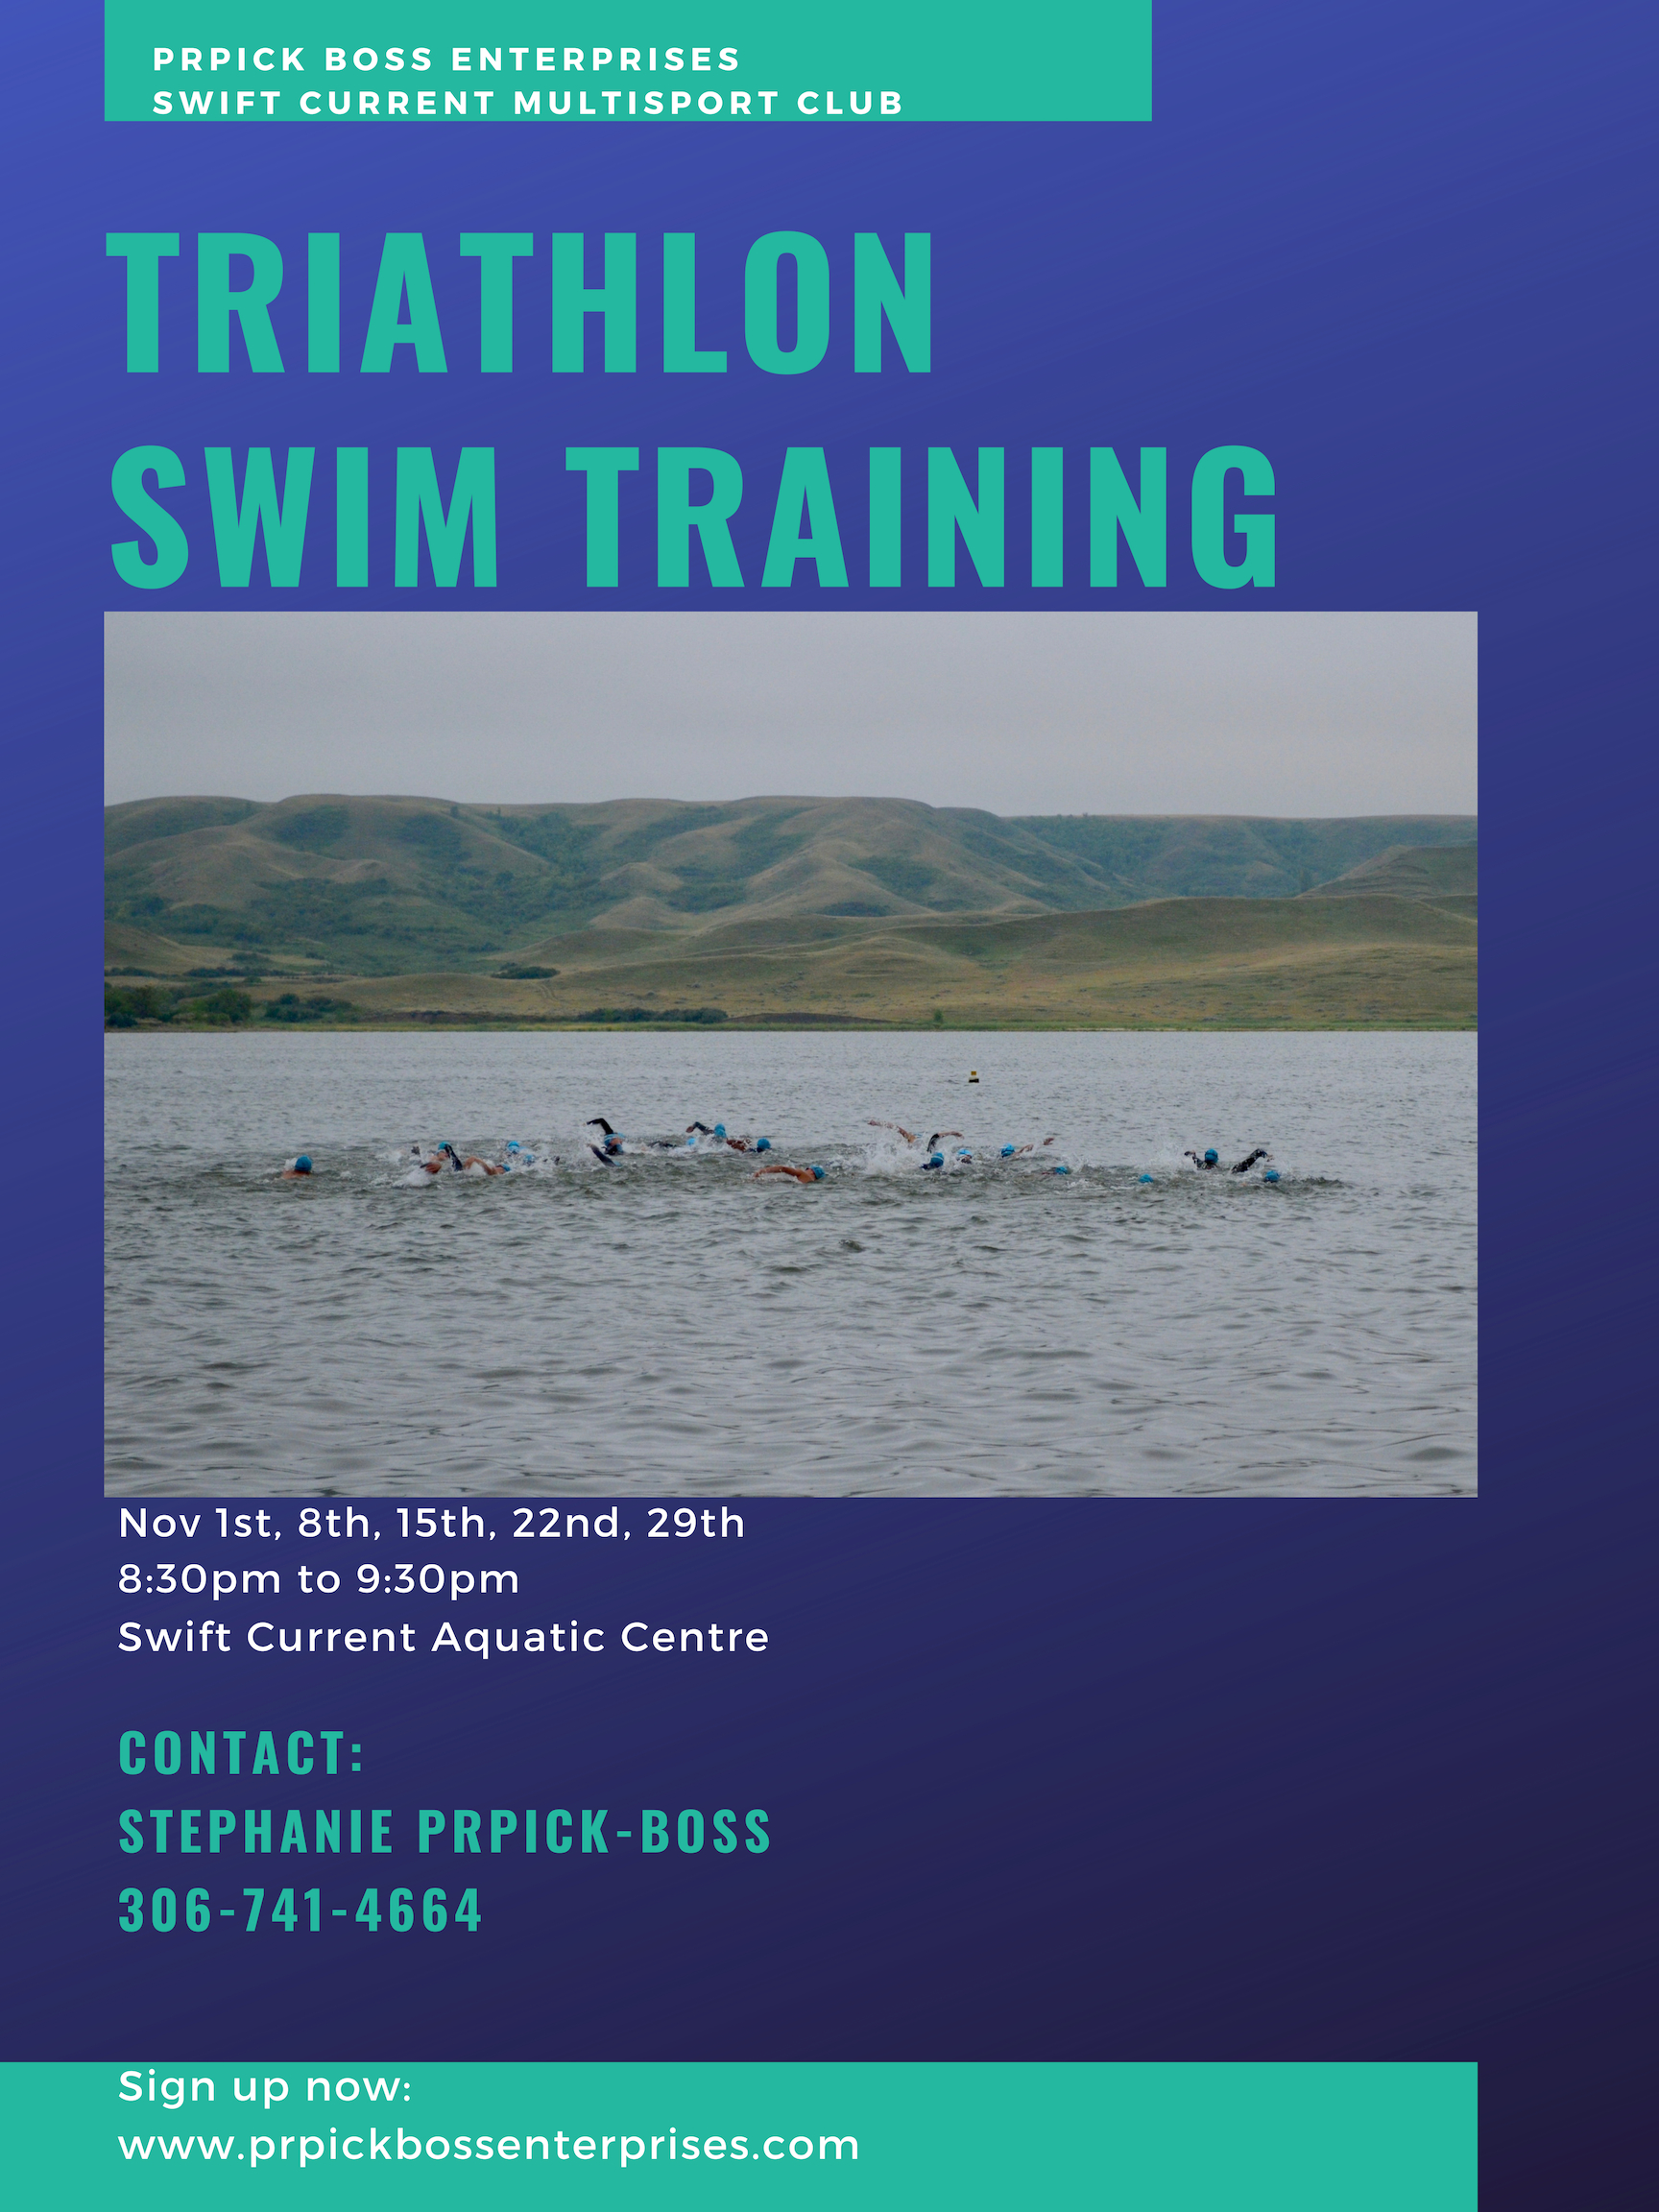 Prpick Boss Enterprises : SCMC Triathlon Swim Training.jpg